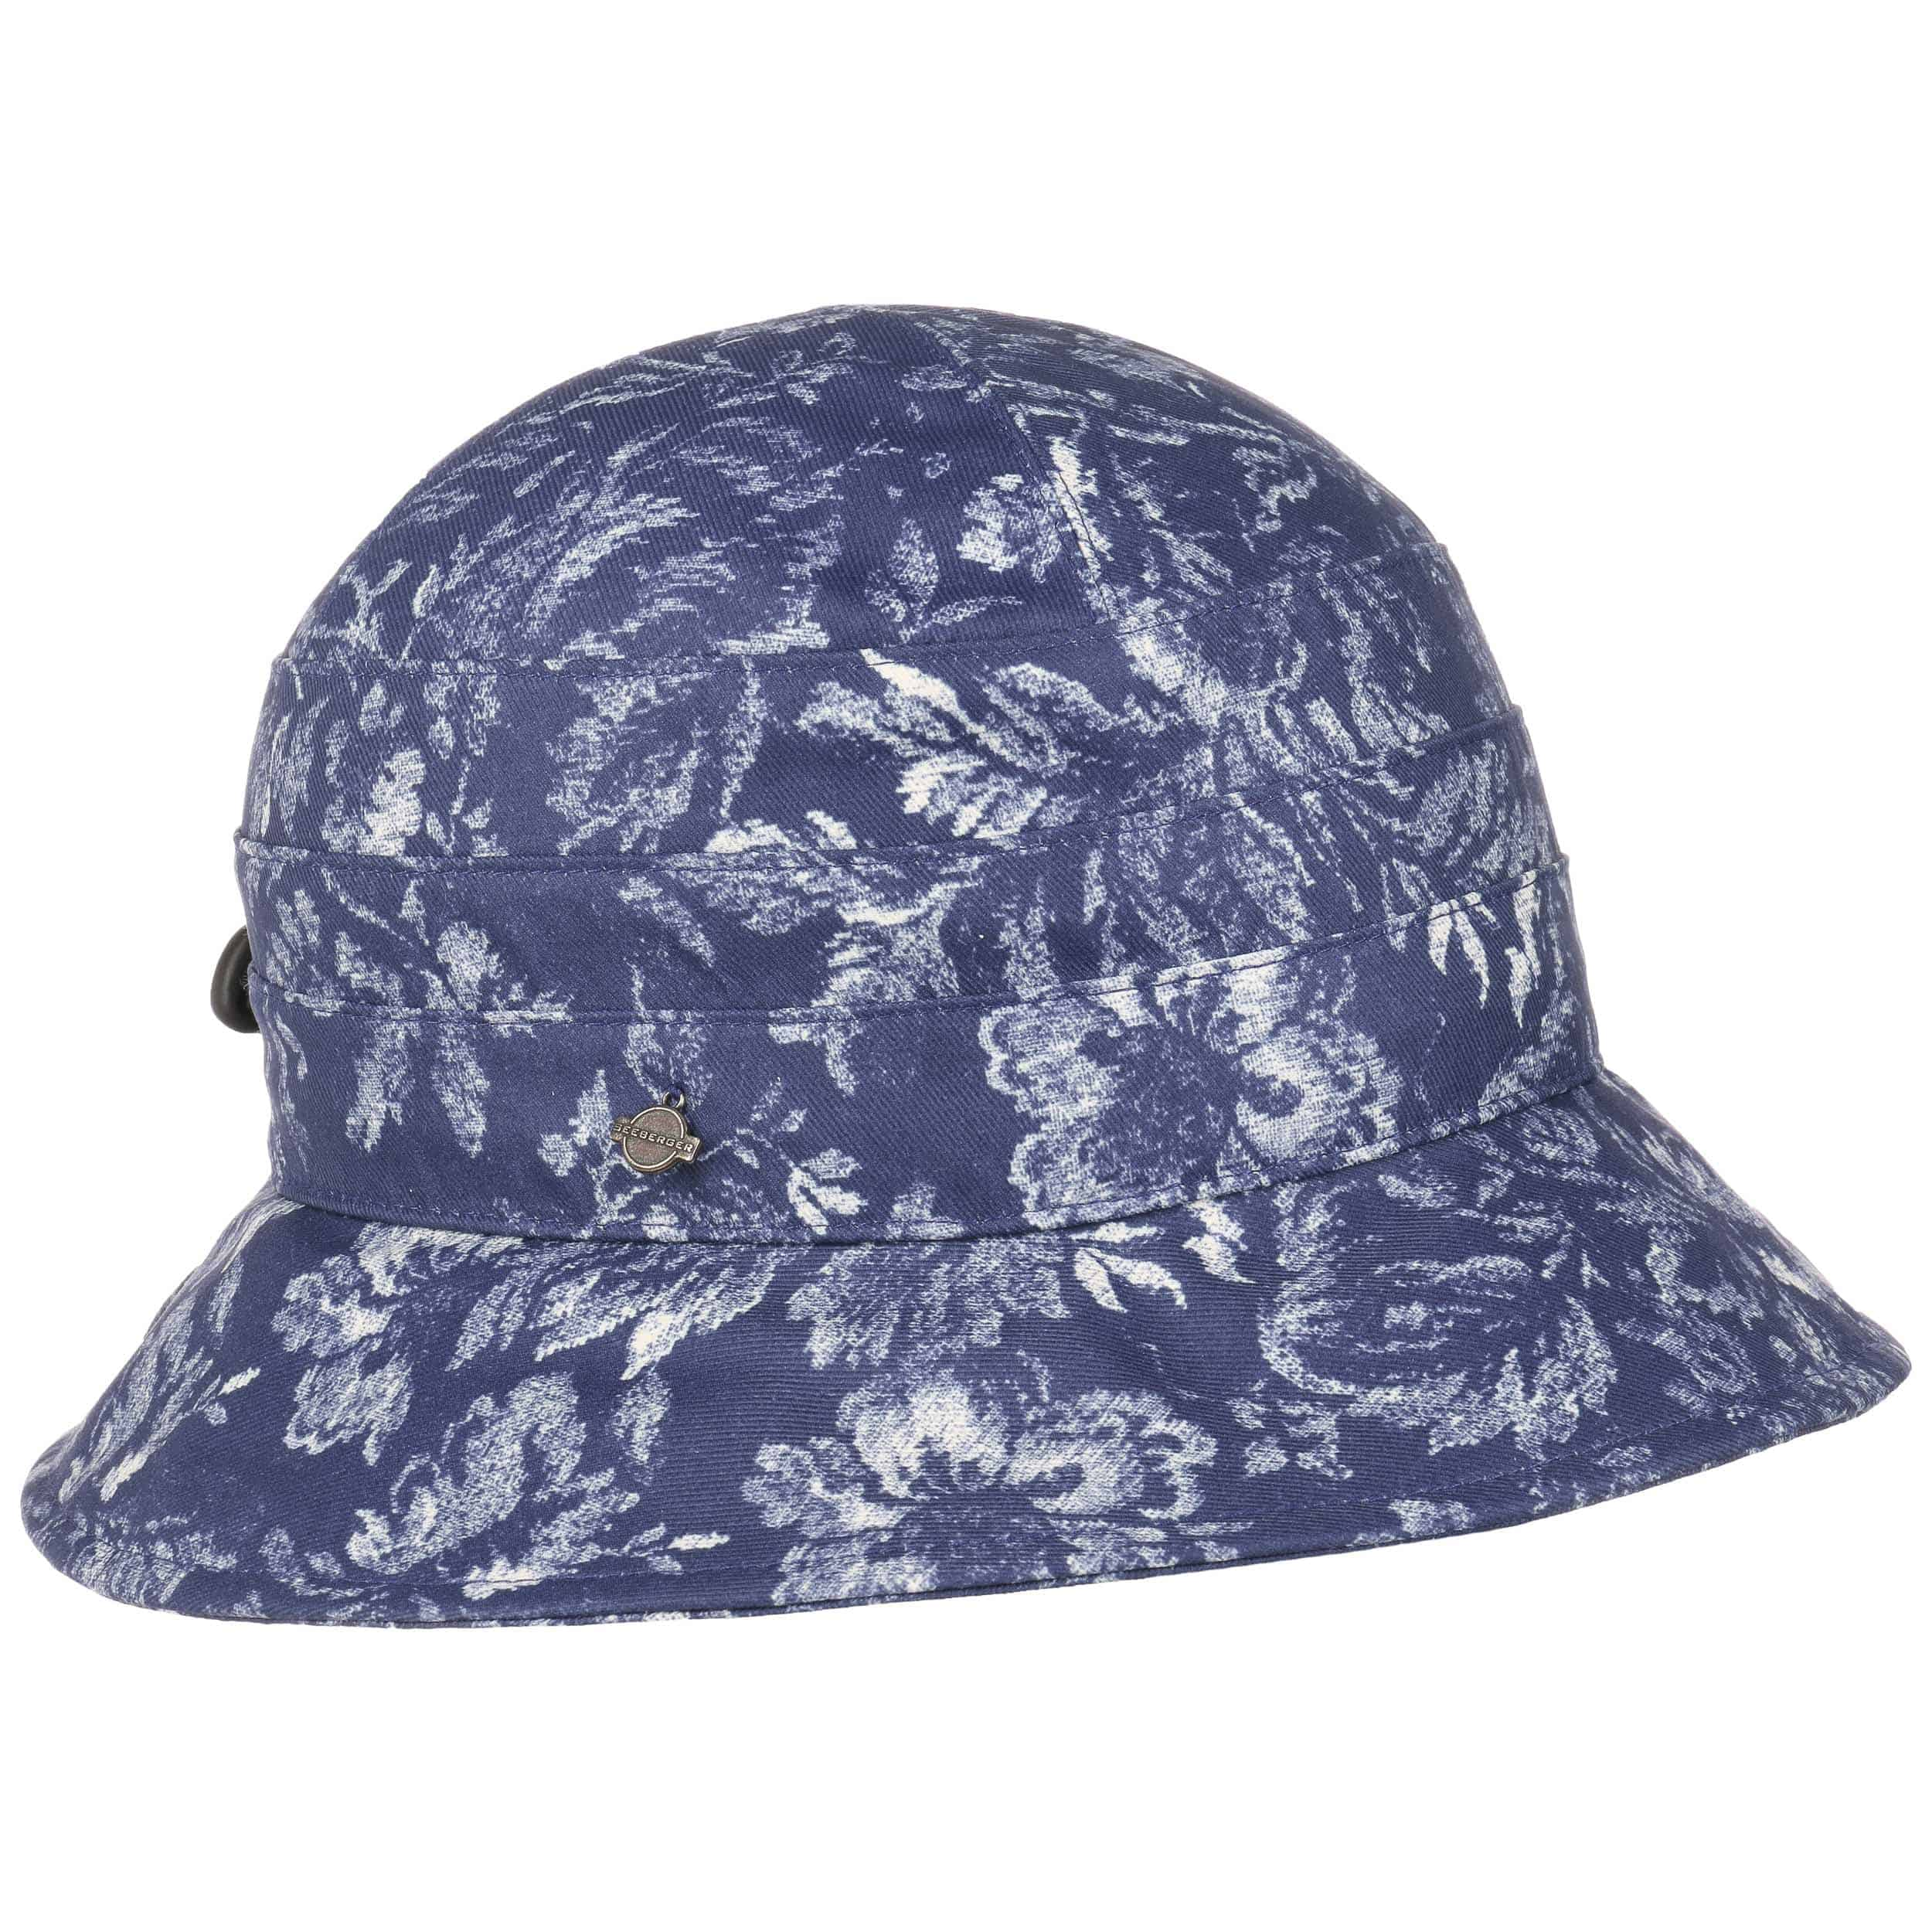 ... Flowery Cloche Rain Hat by Seeberger - blue 1 a0cb2ff56af